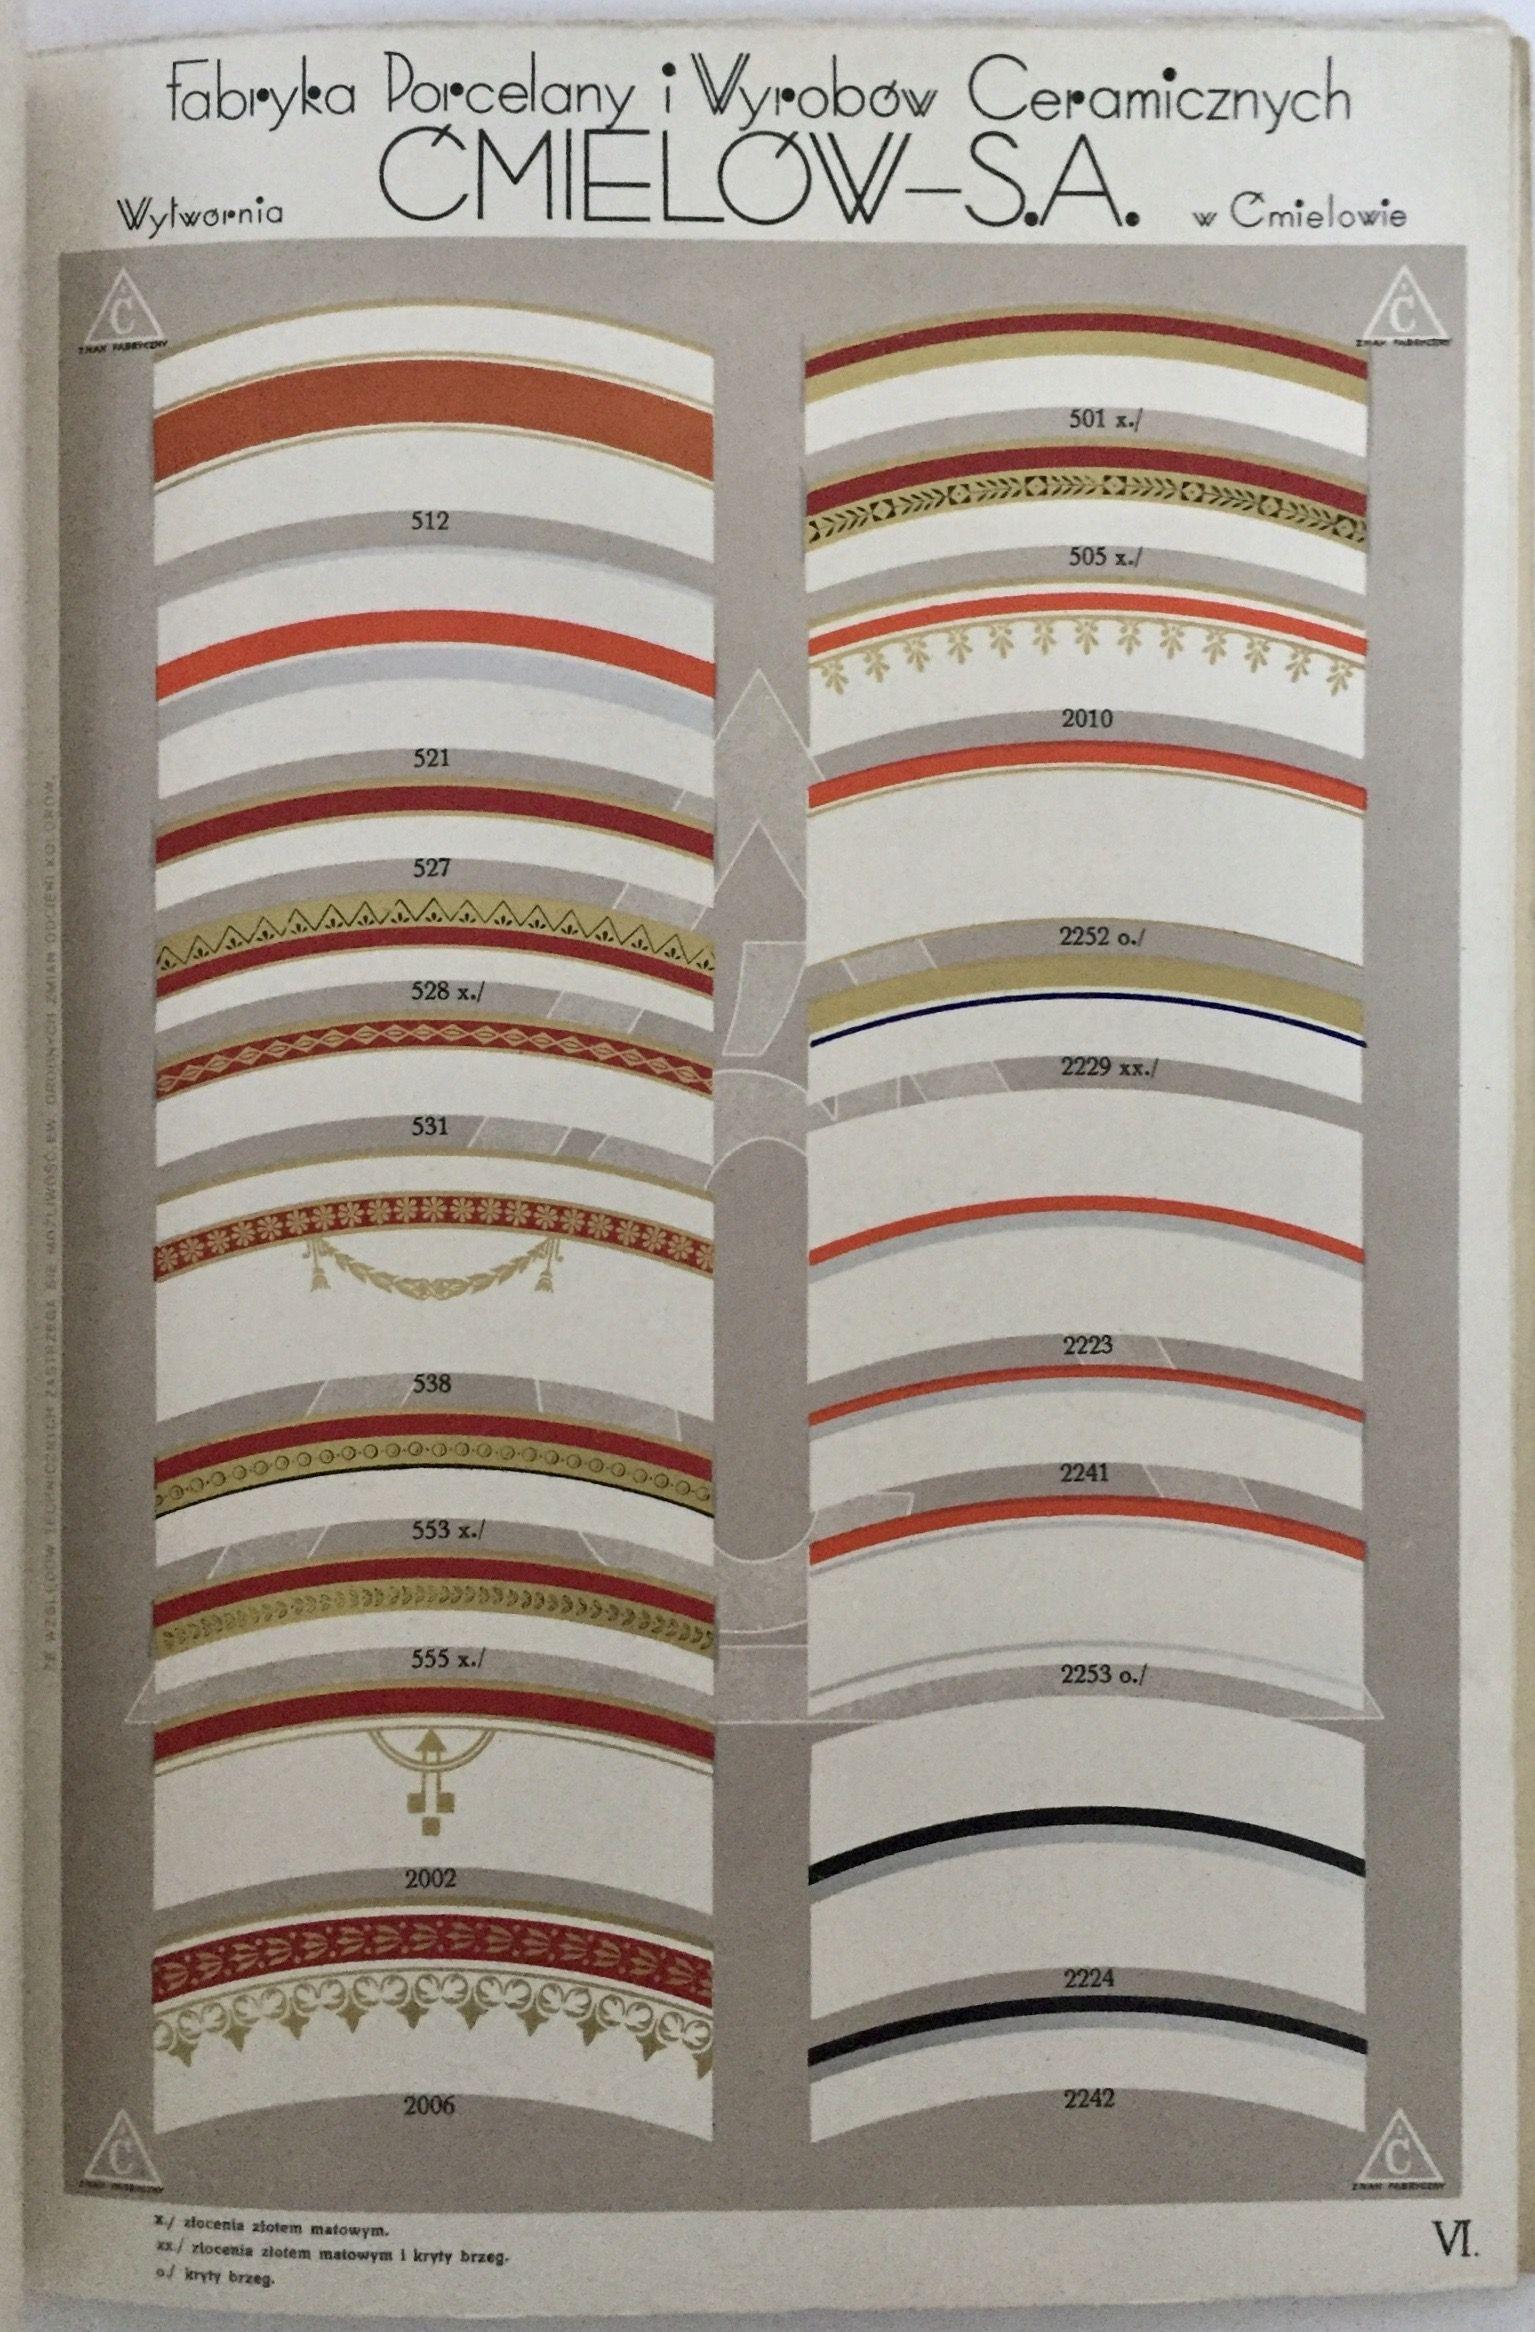 Pin By Jola On Porcelana Polska Notebook Office Supplies